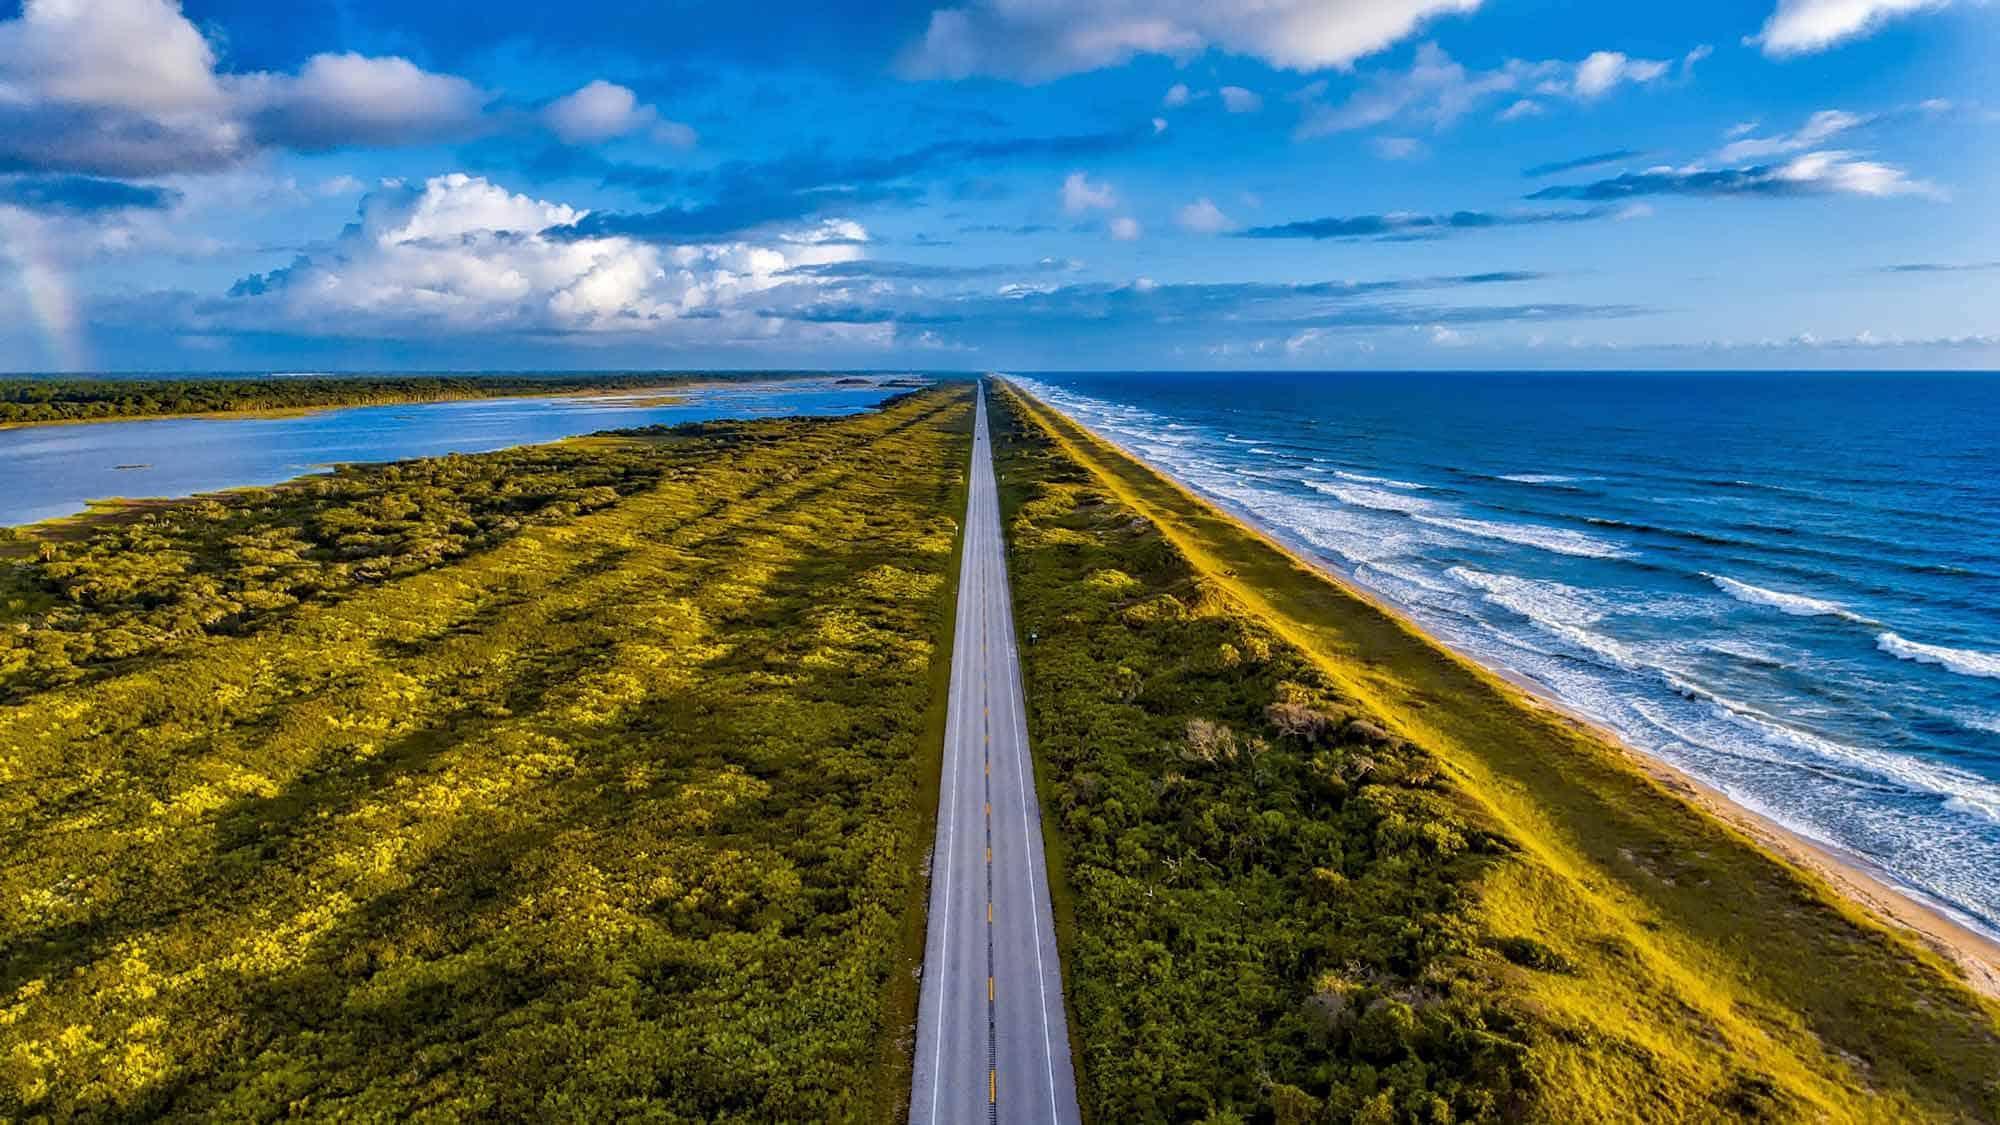 Florida Road Trip Itinerary